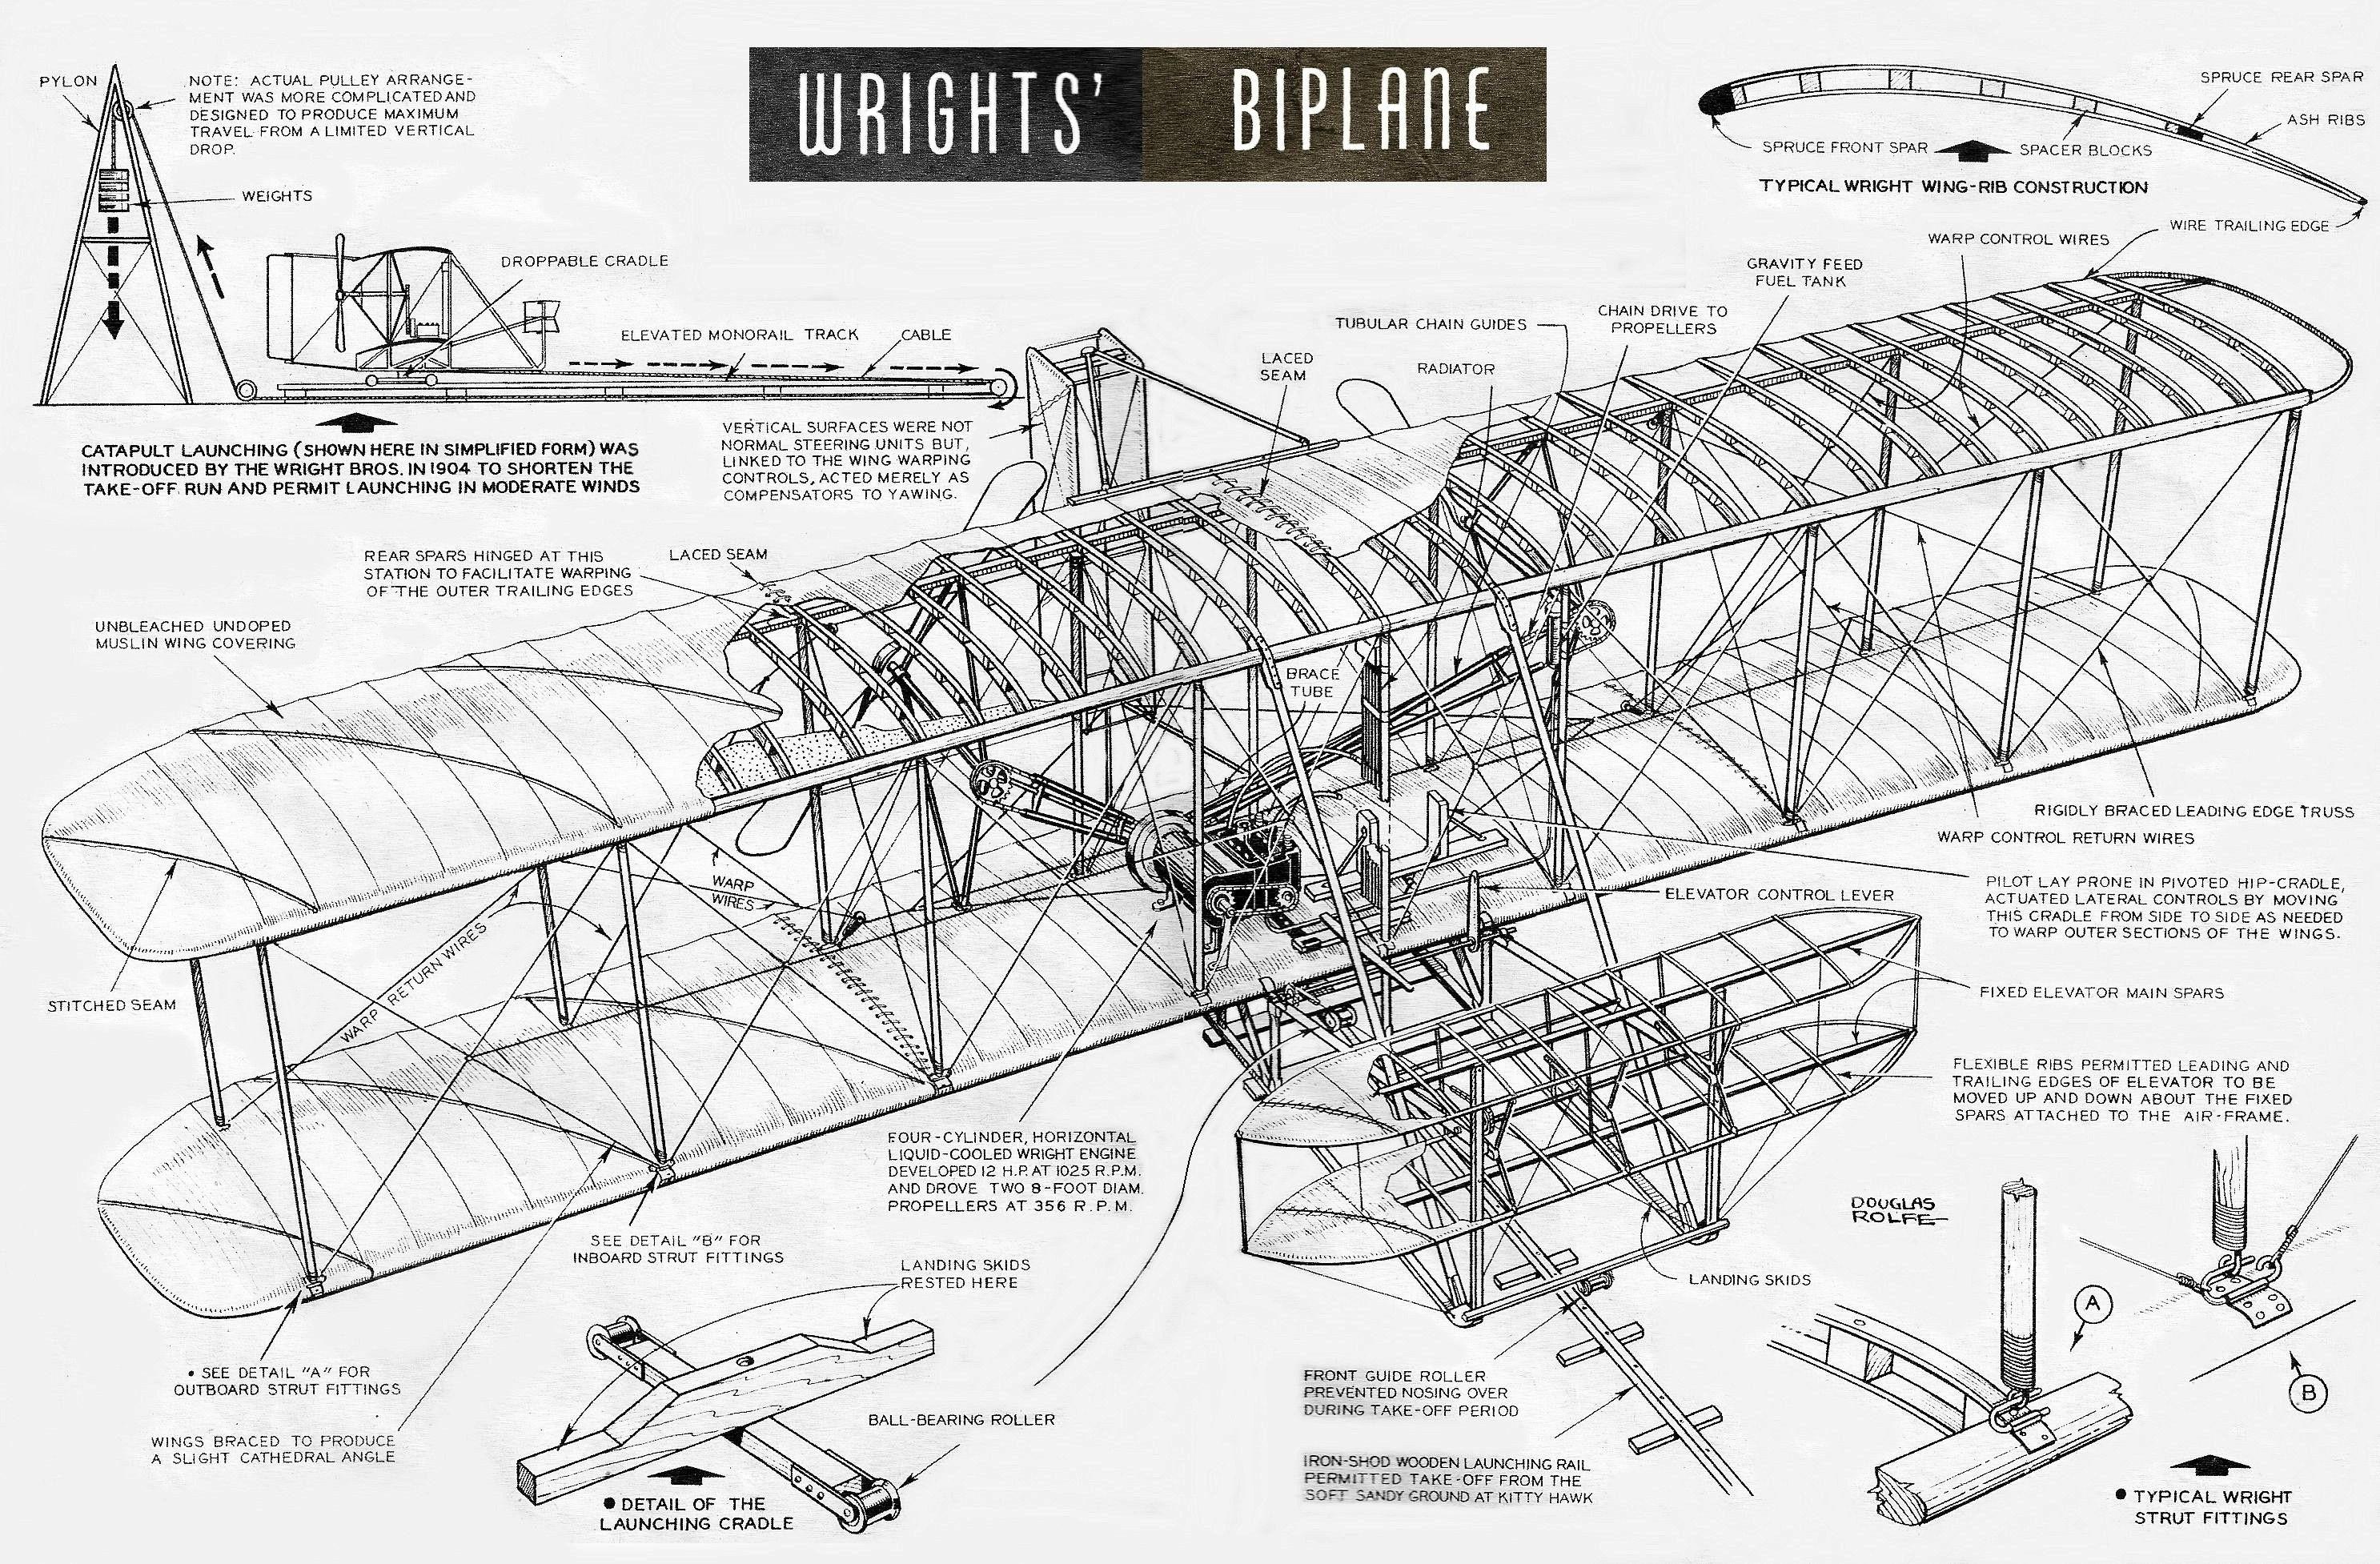 Plane Propeller Diagram Schematics Wiring Diagrams Peugeot 206 Rear Windows Heated Window Wilbur Wright U2019s Birthday A Stamp Day Shaft Airplane